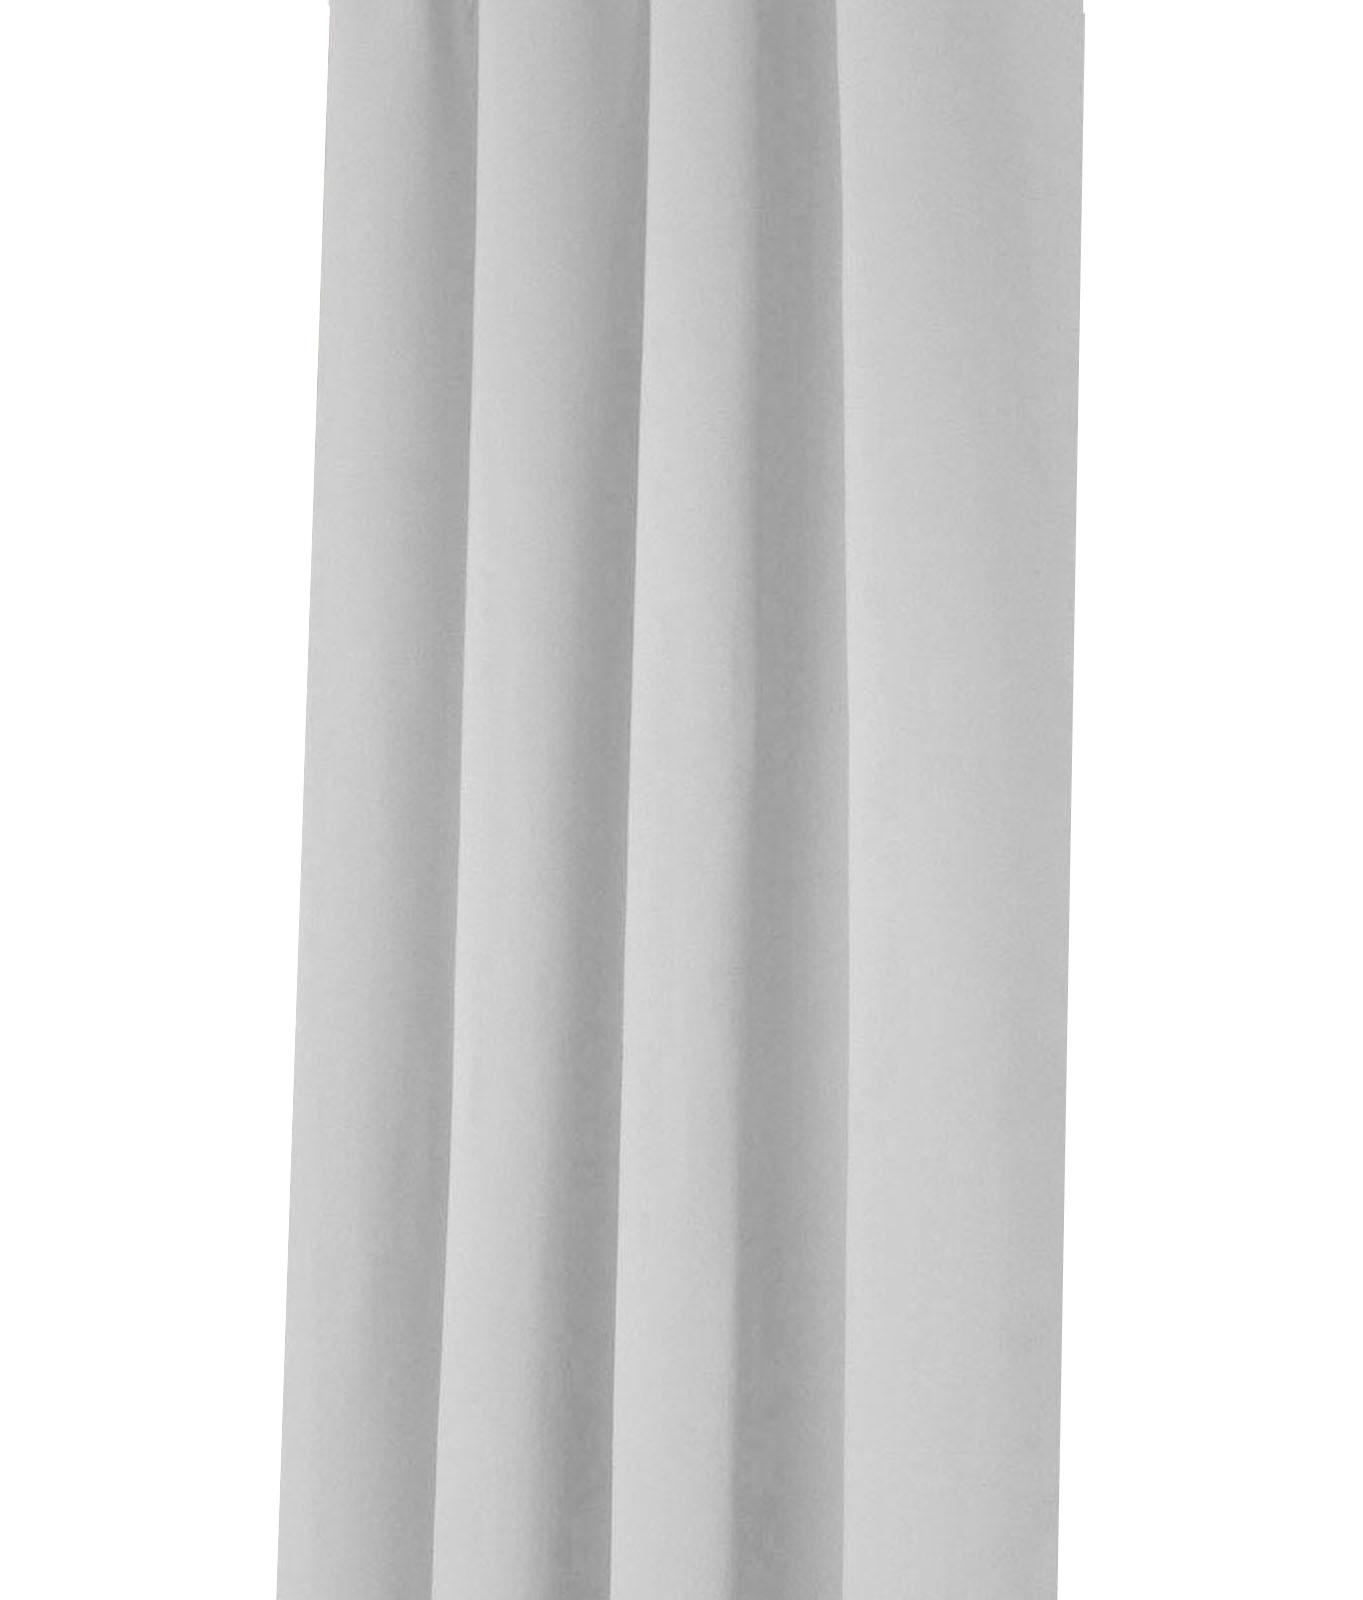 Vorhang-VERDUNKELUNG-Kraeuselband-Osen-Schlaufe-Thermo-Gardine-Blickdicht